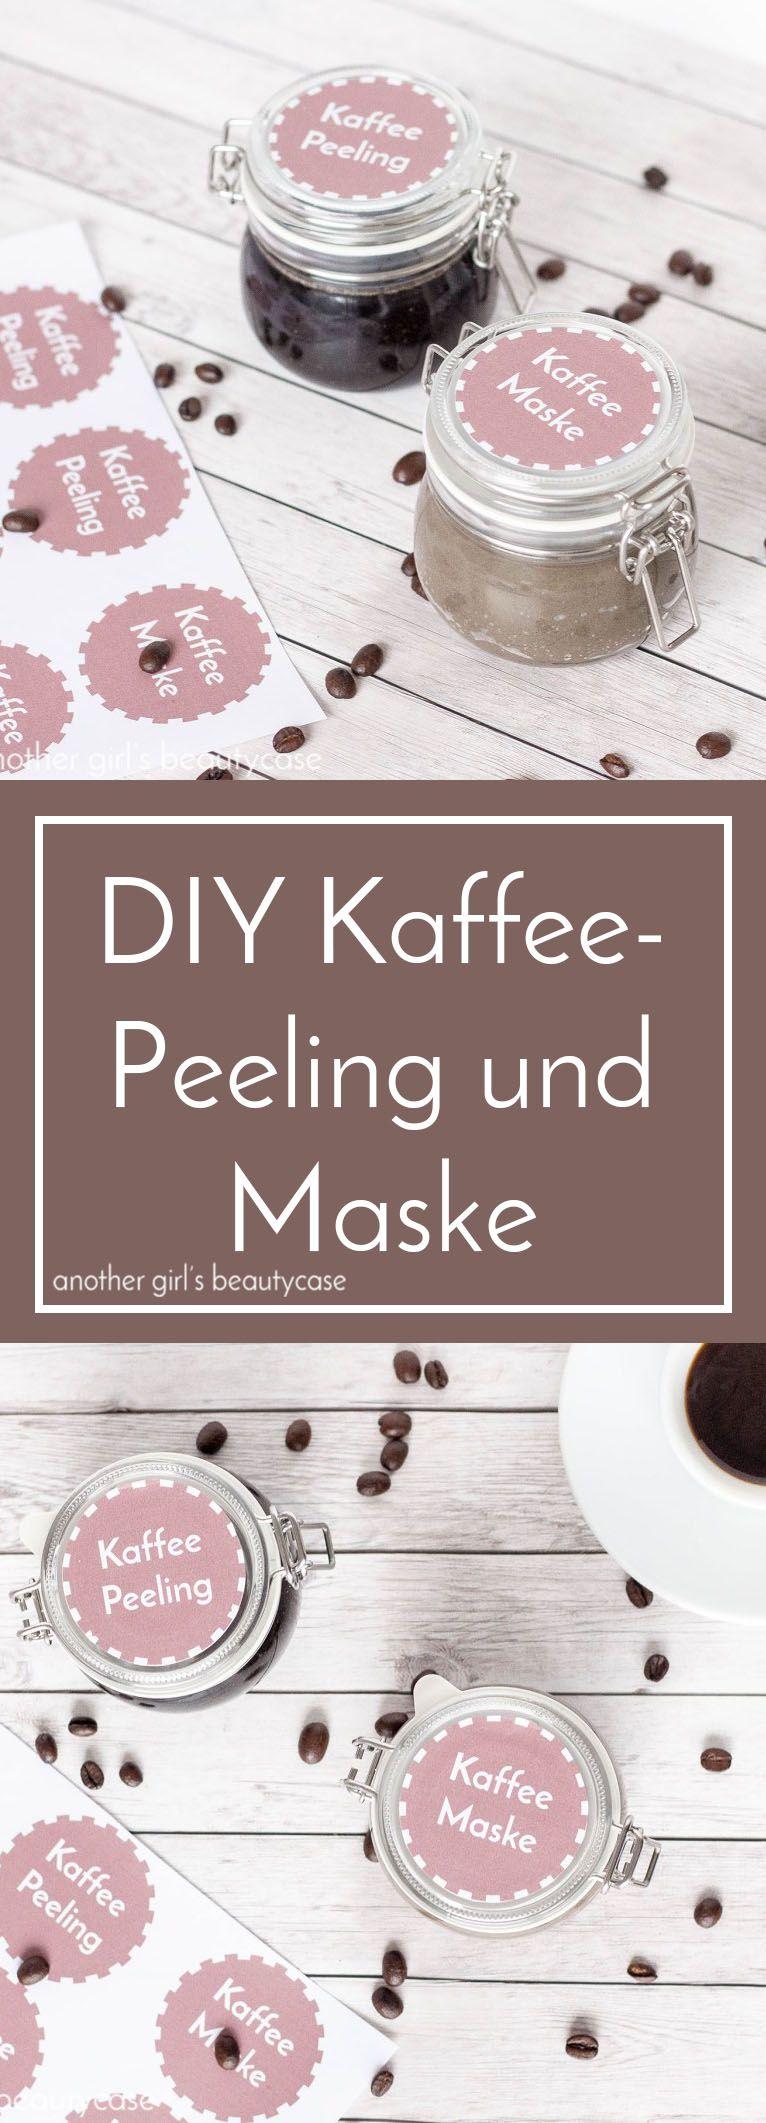 Photo of DIY coffee scrub and mask